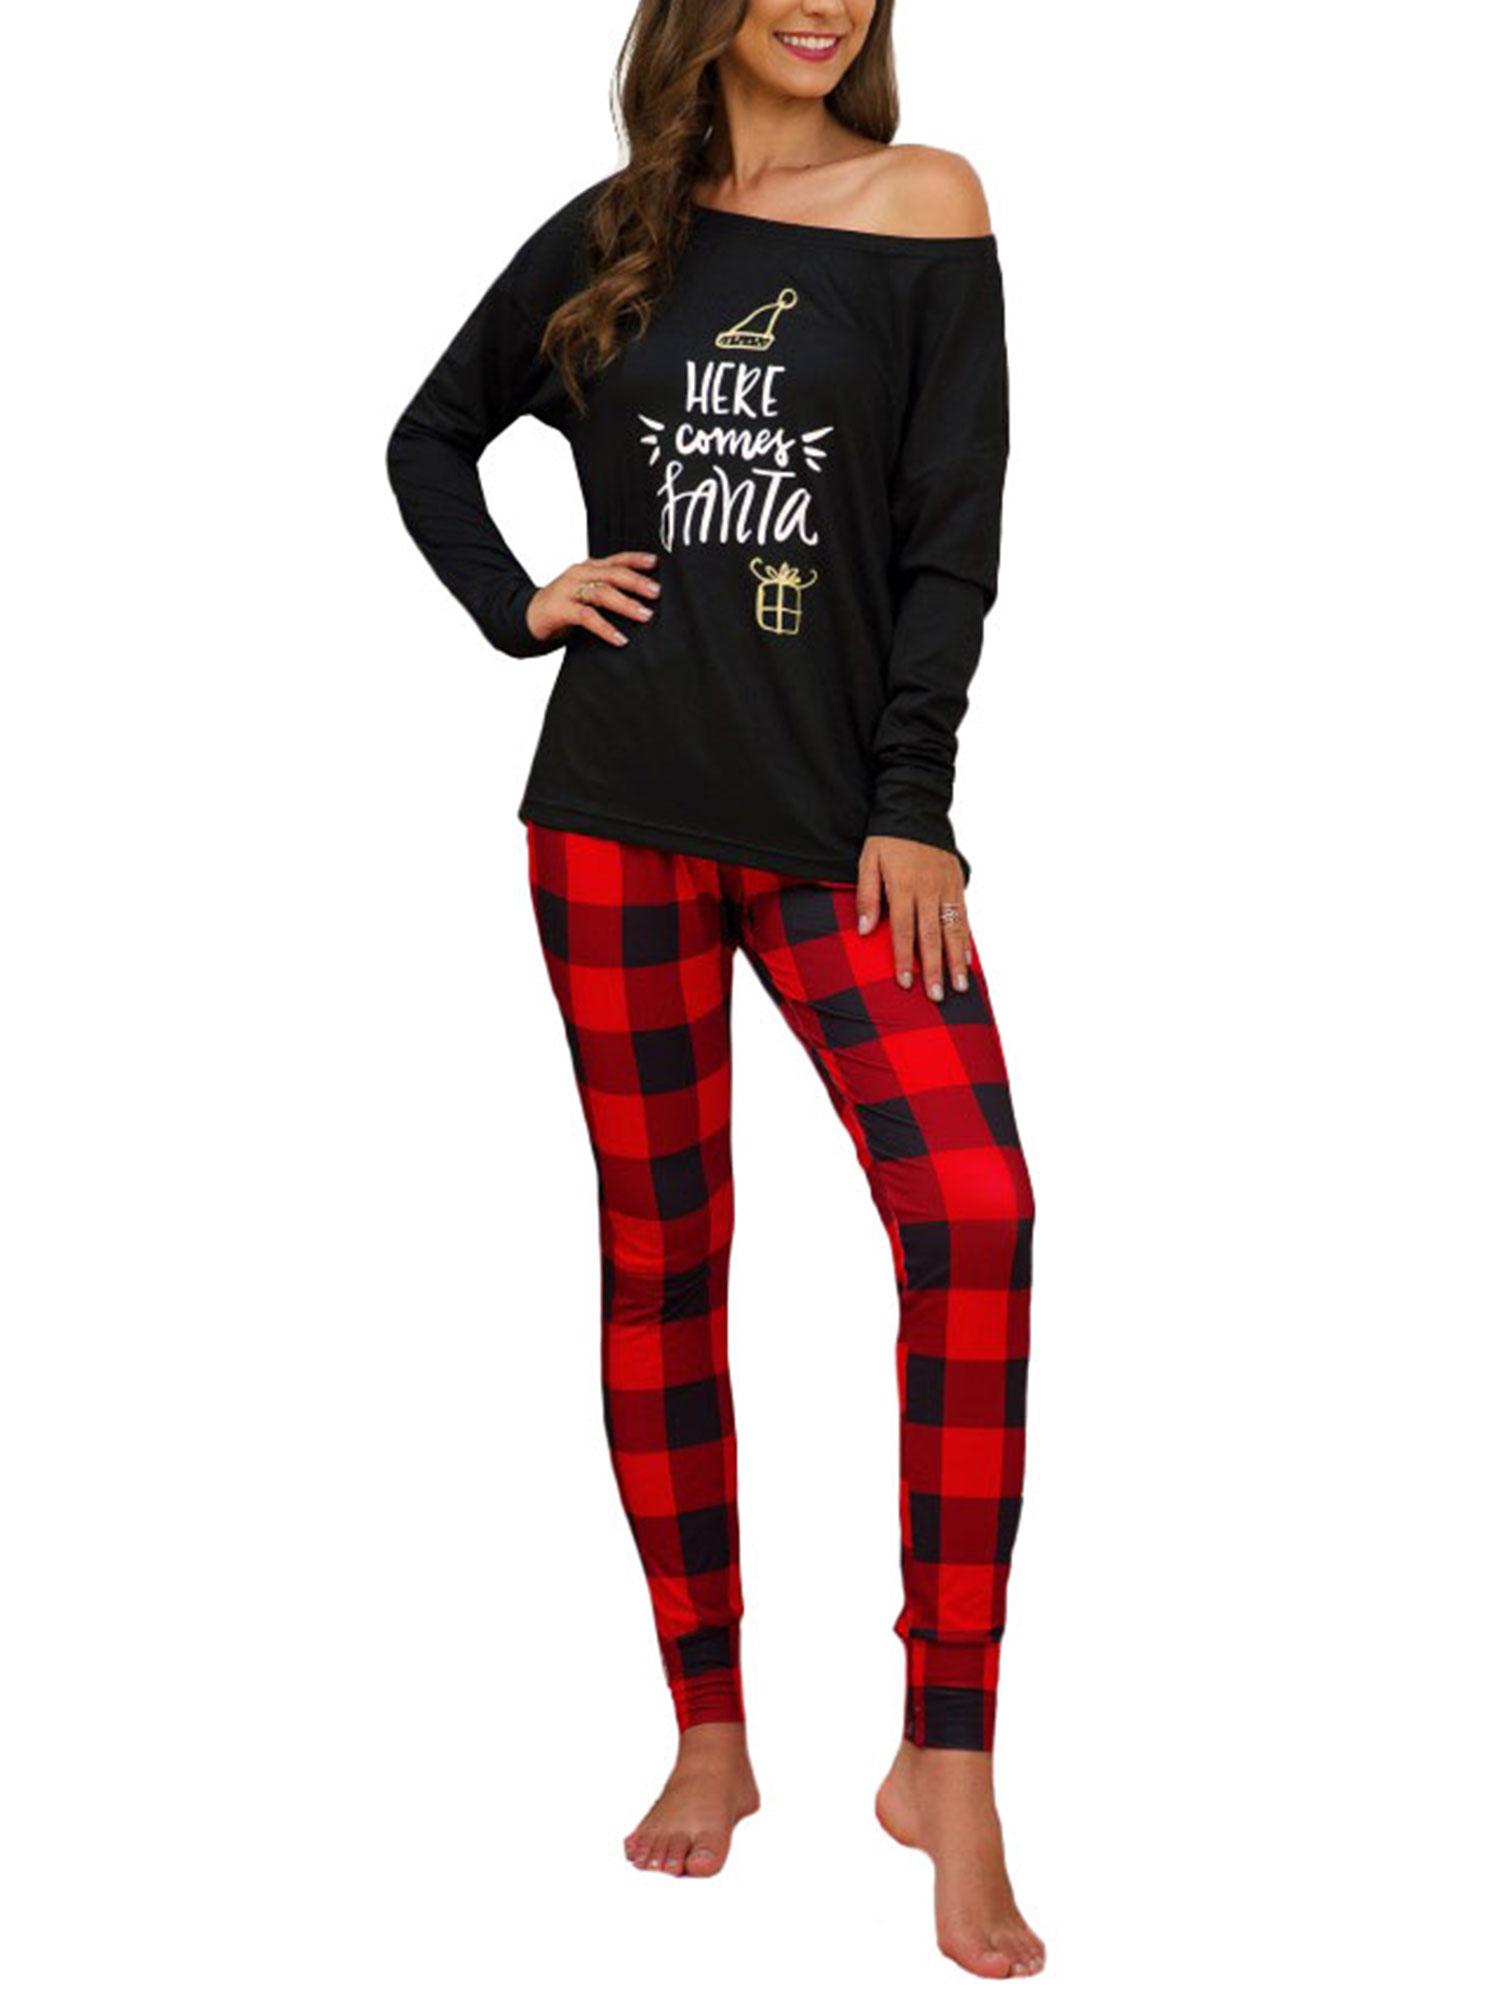 Kids Girls Loose Fit Nightwear Sleepwear Casual Lounge Pants Pyjamas PJ Bottoms